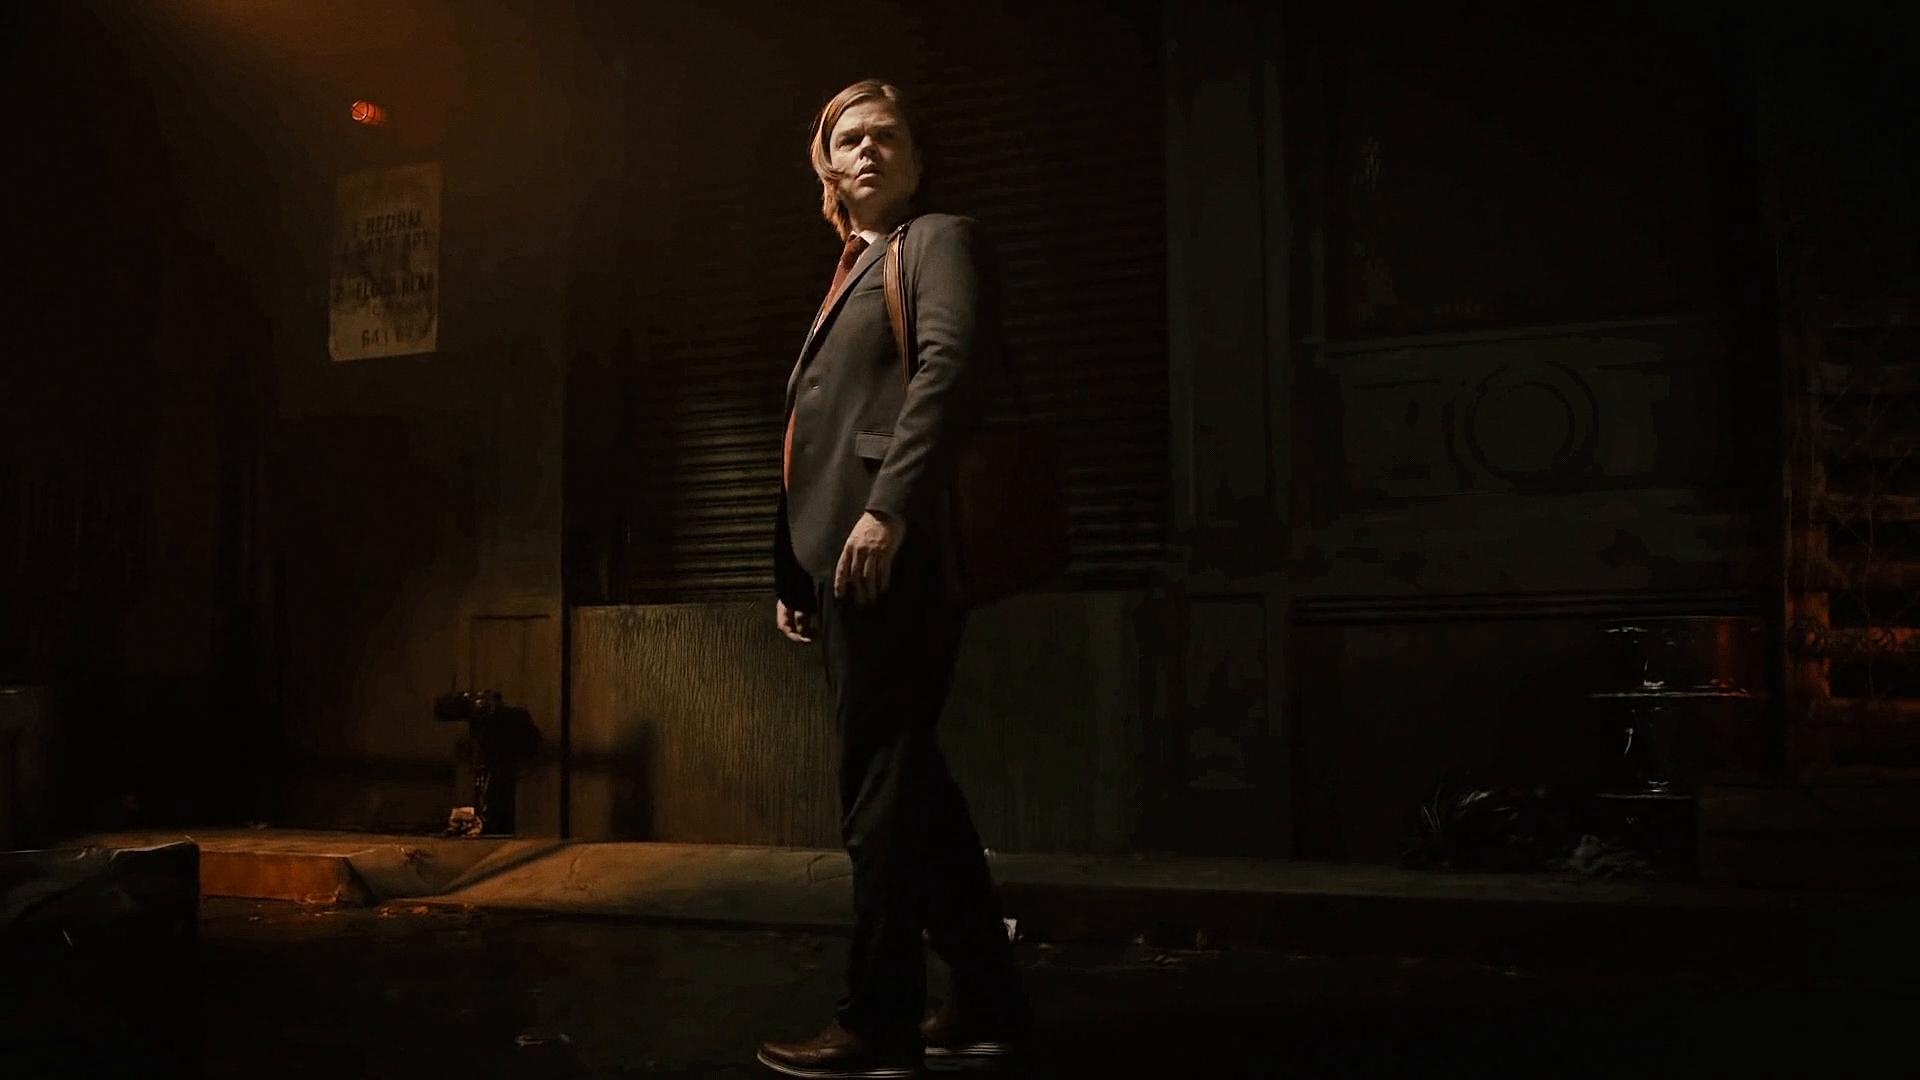 Netflix Daredevil Season II. Motion Foggy